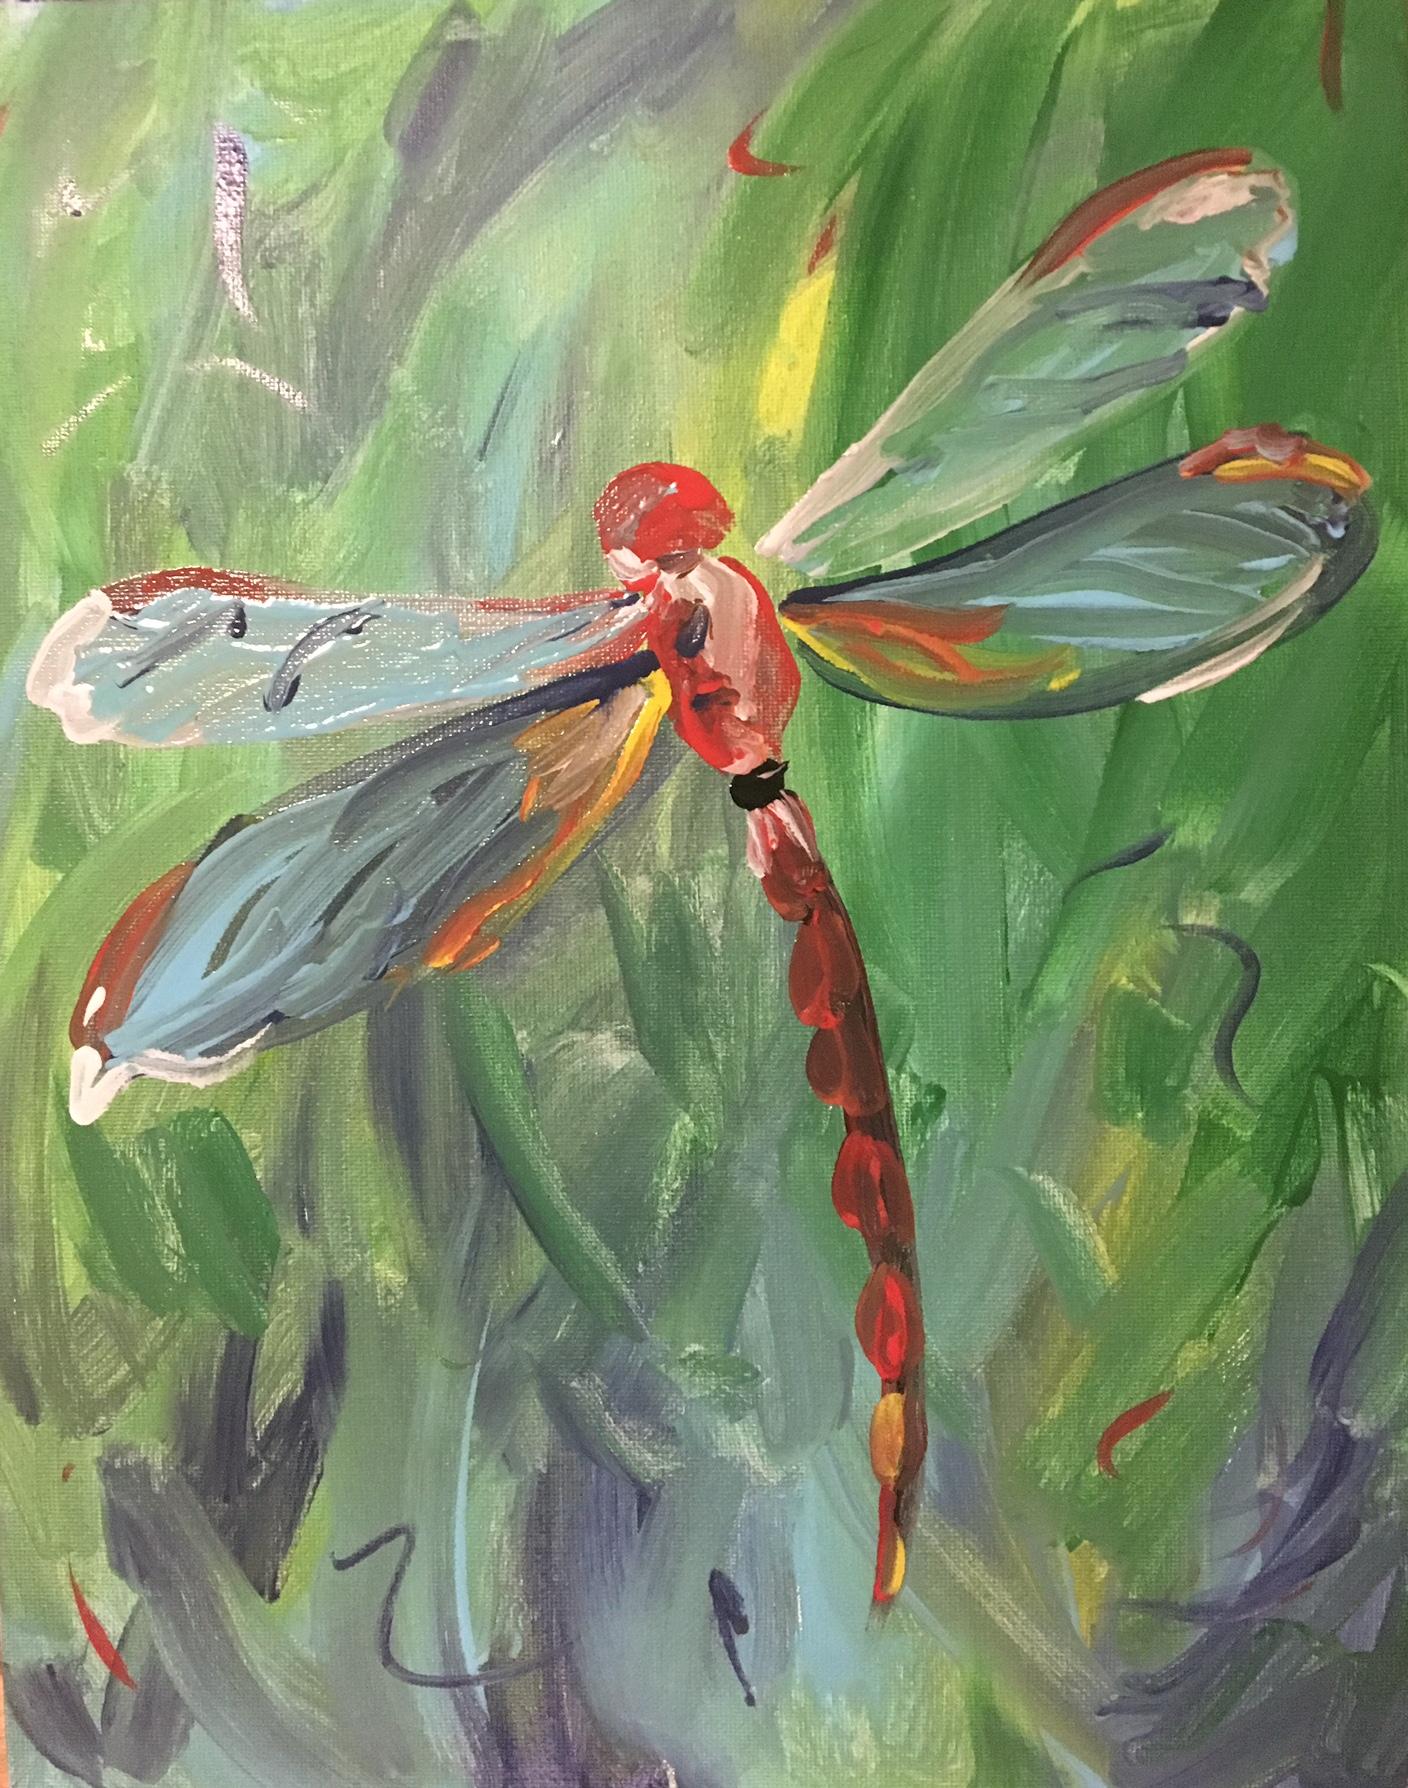 flit fly dragonfly